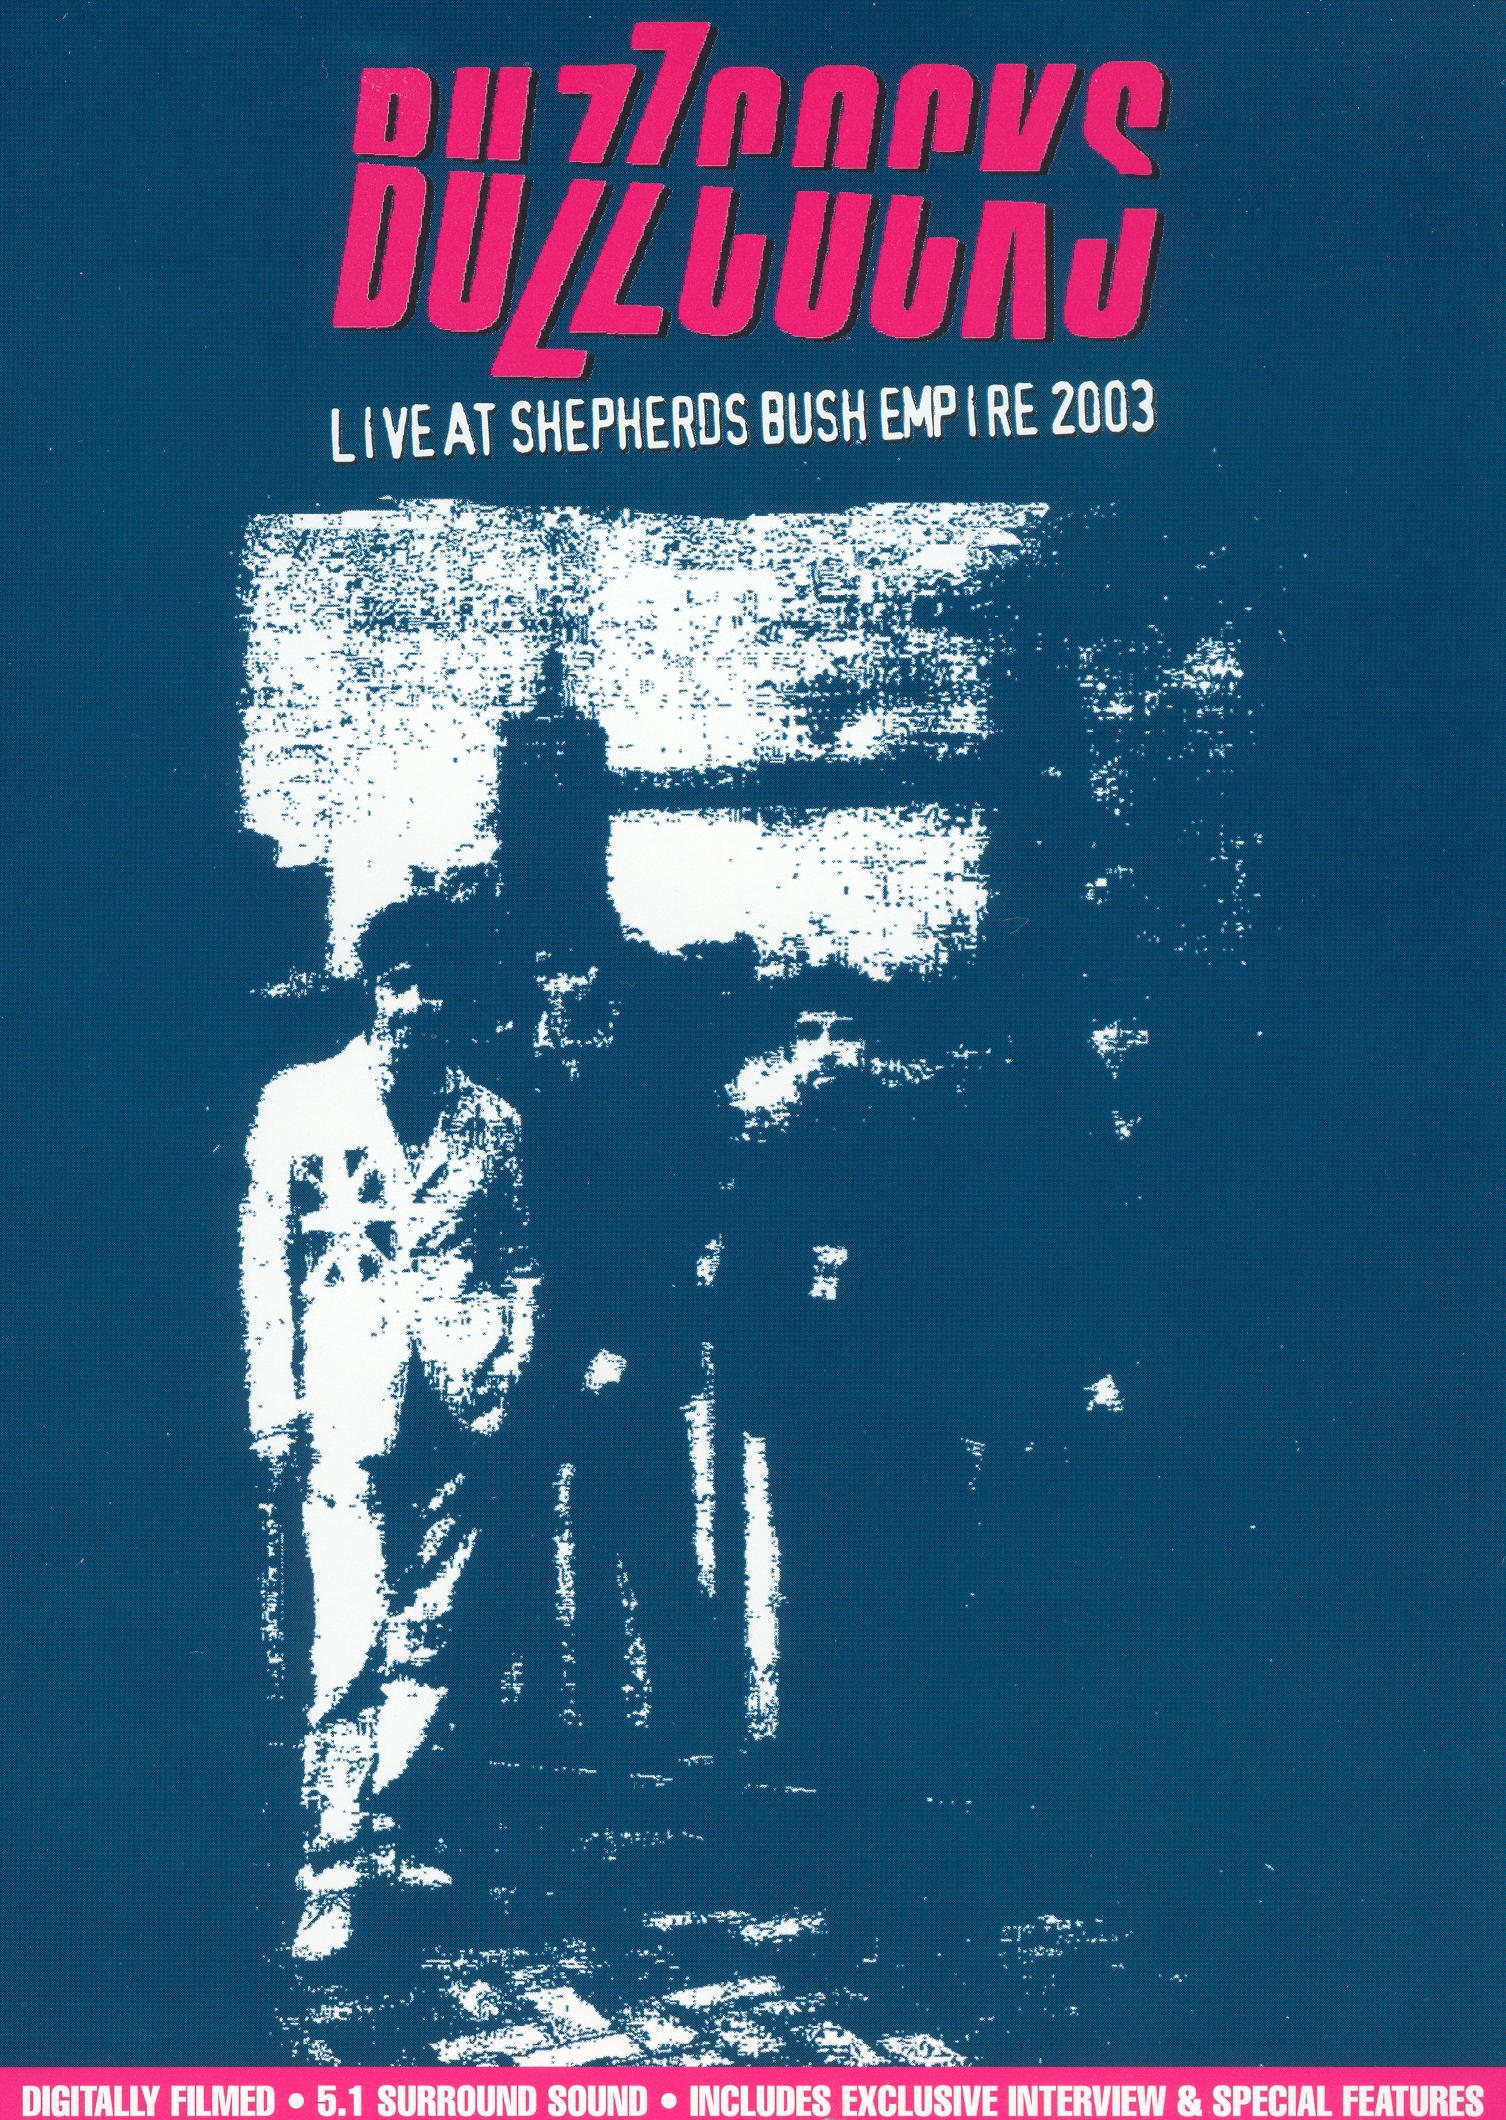 Buzzcocks: Live at Shepherds Bush Empire 2003